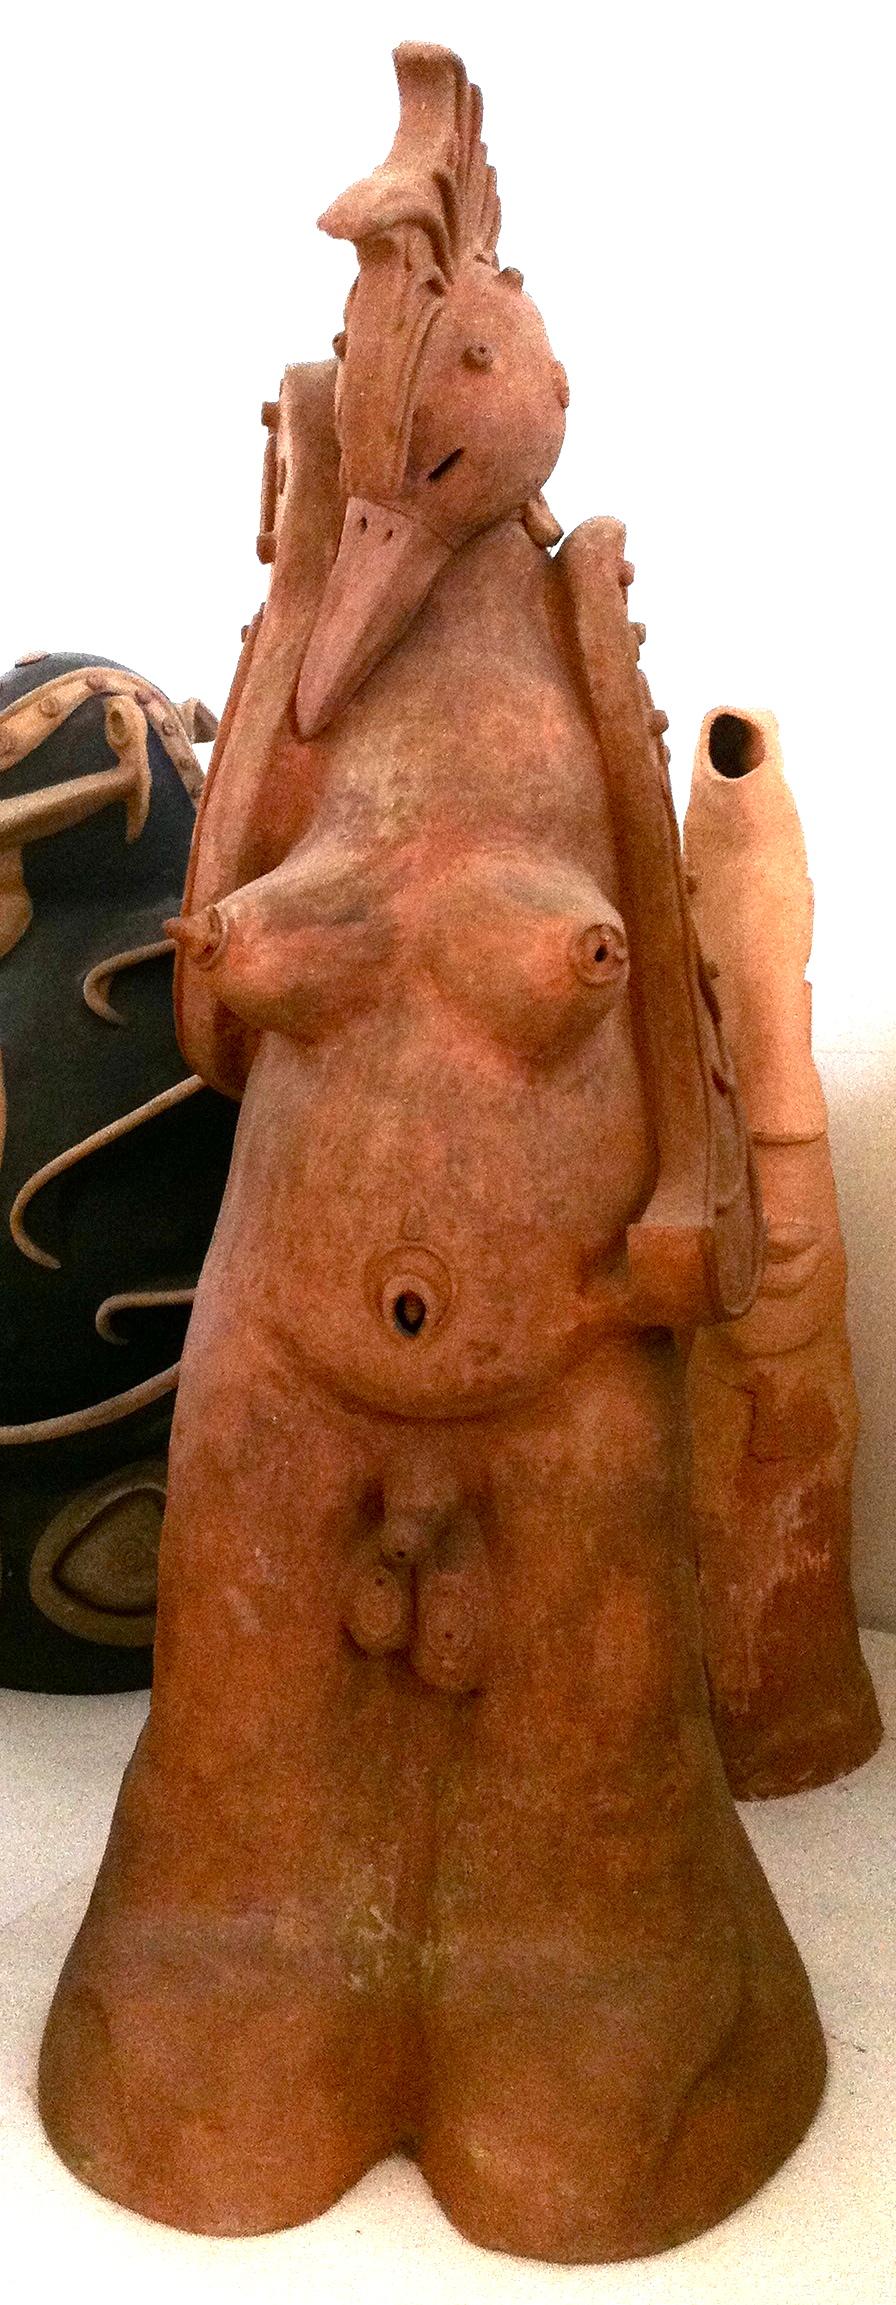 Shrine #2 - Sculpture